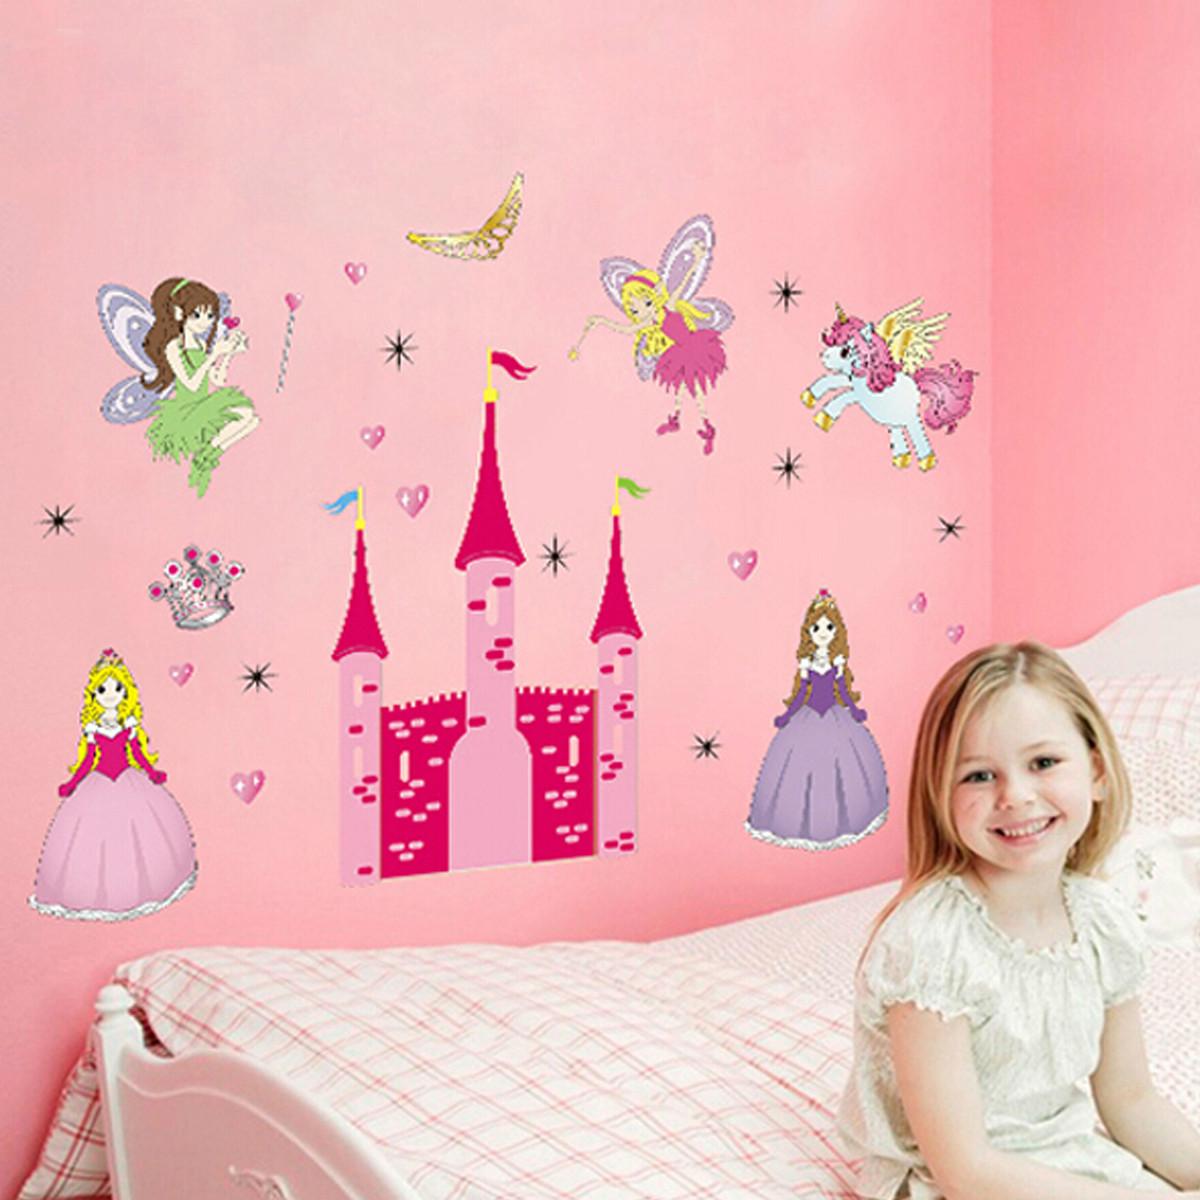 removable vinyl mural wall sticker fairy princess castle luxury fairy princess nursery wall stickers